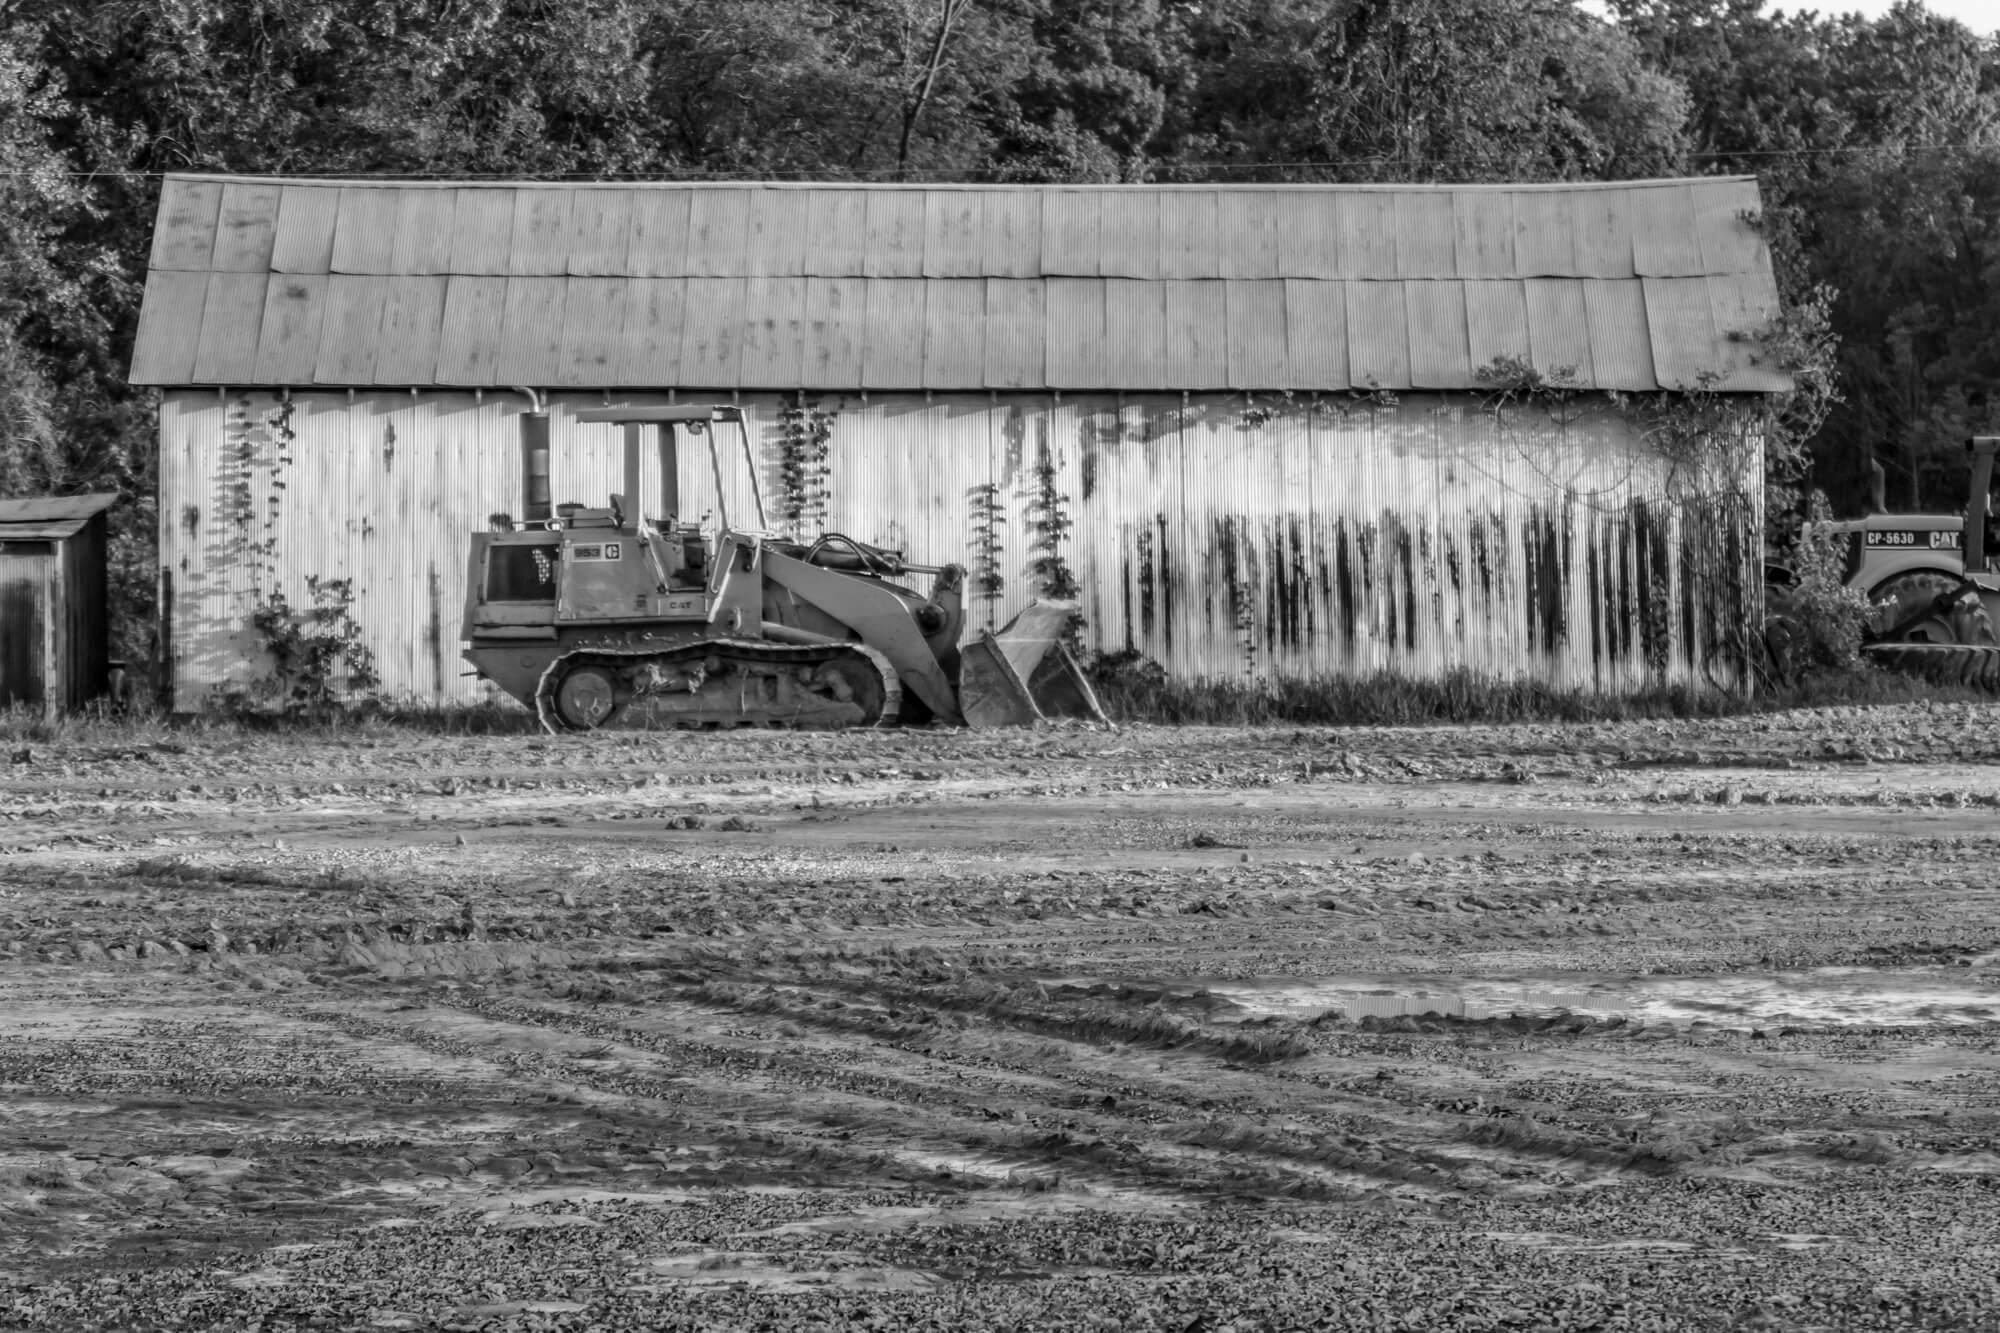 Bethel_Ridge_Farms_O'Fallon_Illinois_1-14.jpg